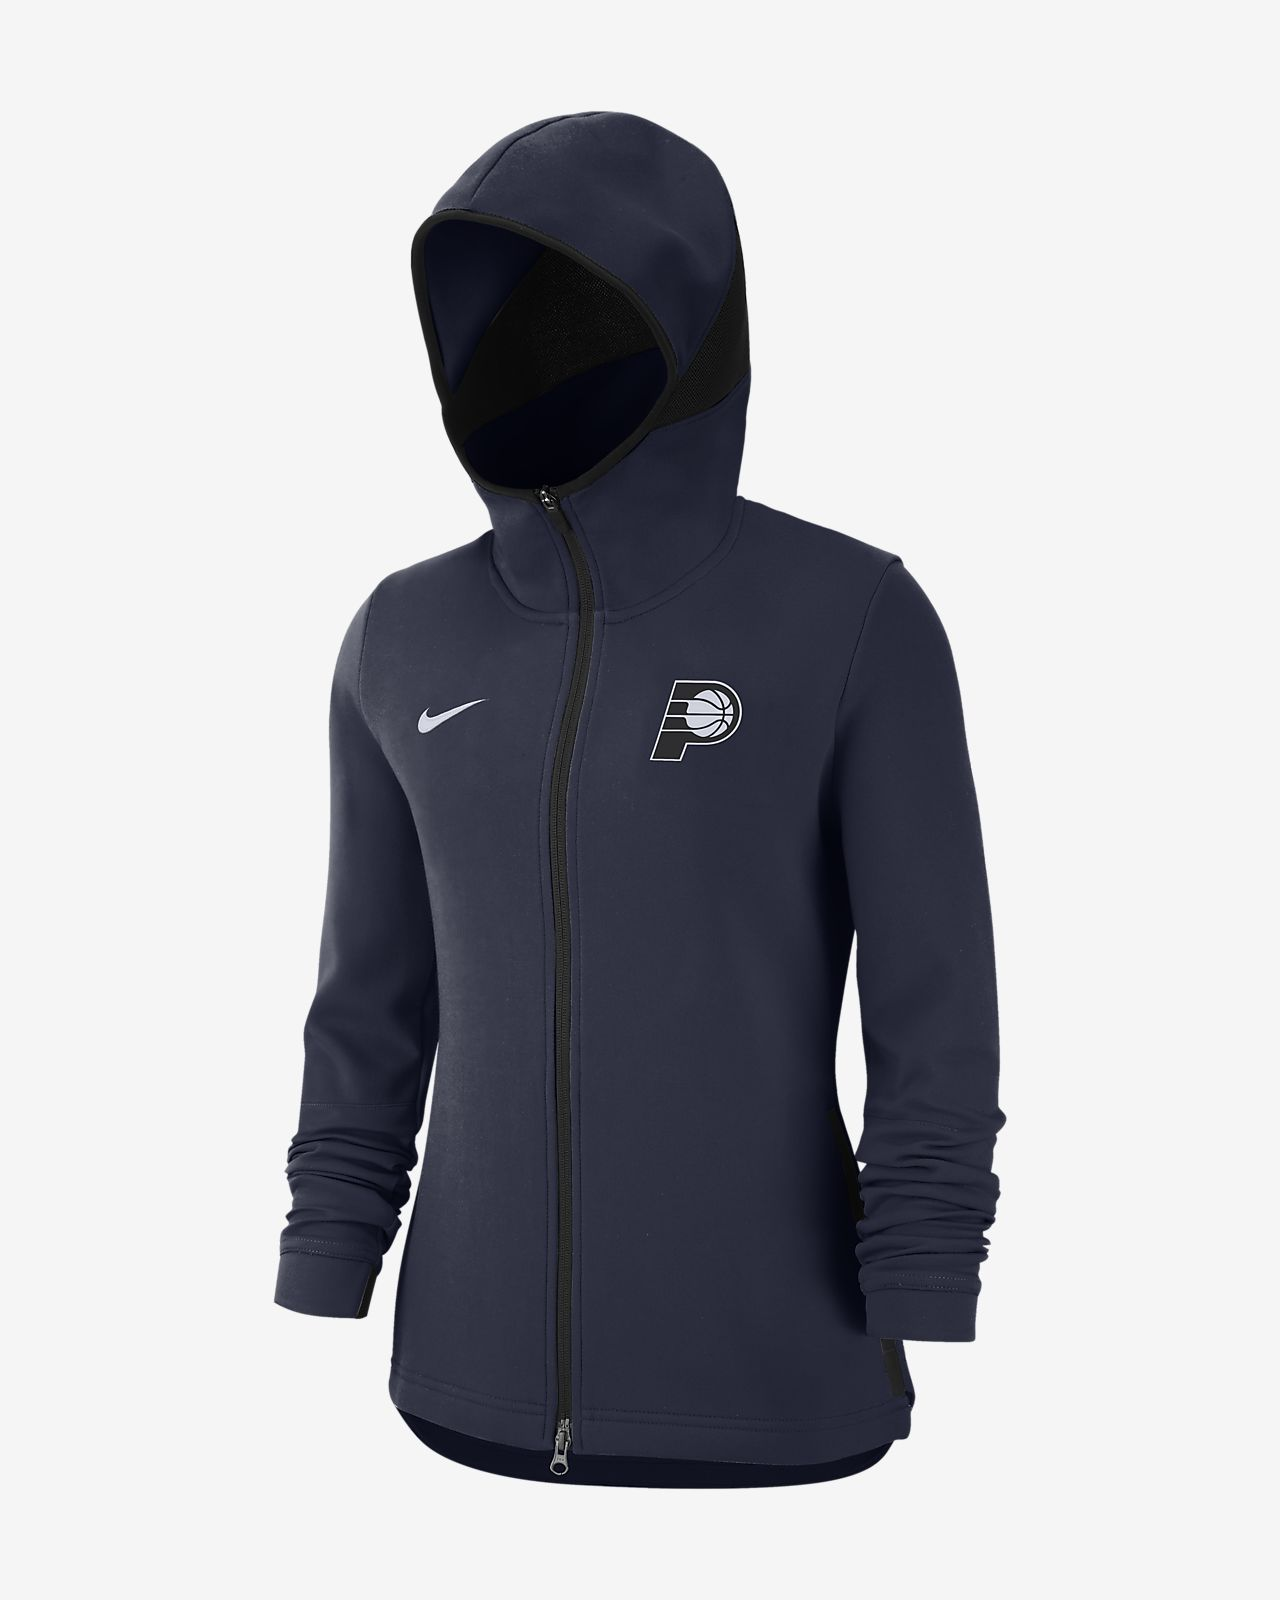 Indiana Pacers Nike Dri-FIT Showtime Women's NBA Hoodie